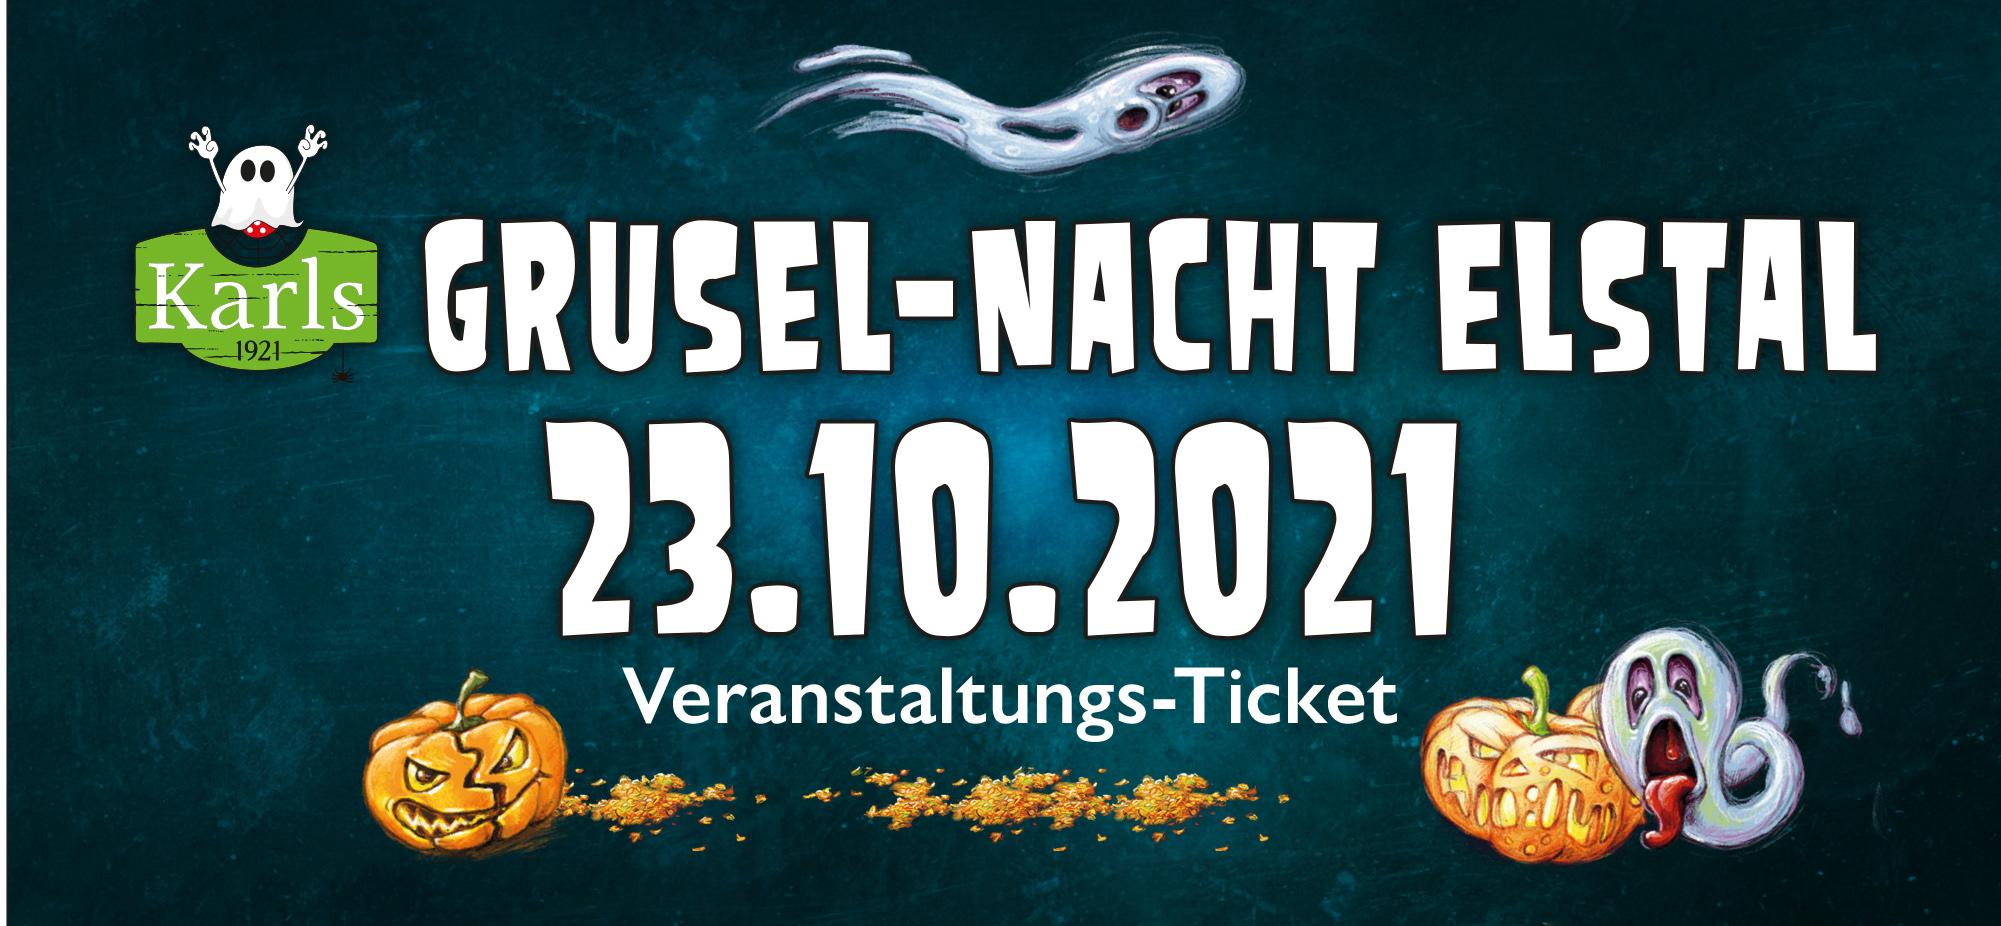 Grusel-Nacht Elstal 23.10.2021 - ruckzuck per Mail